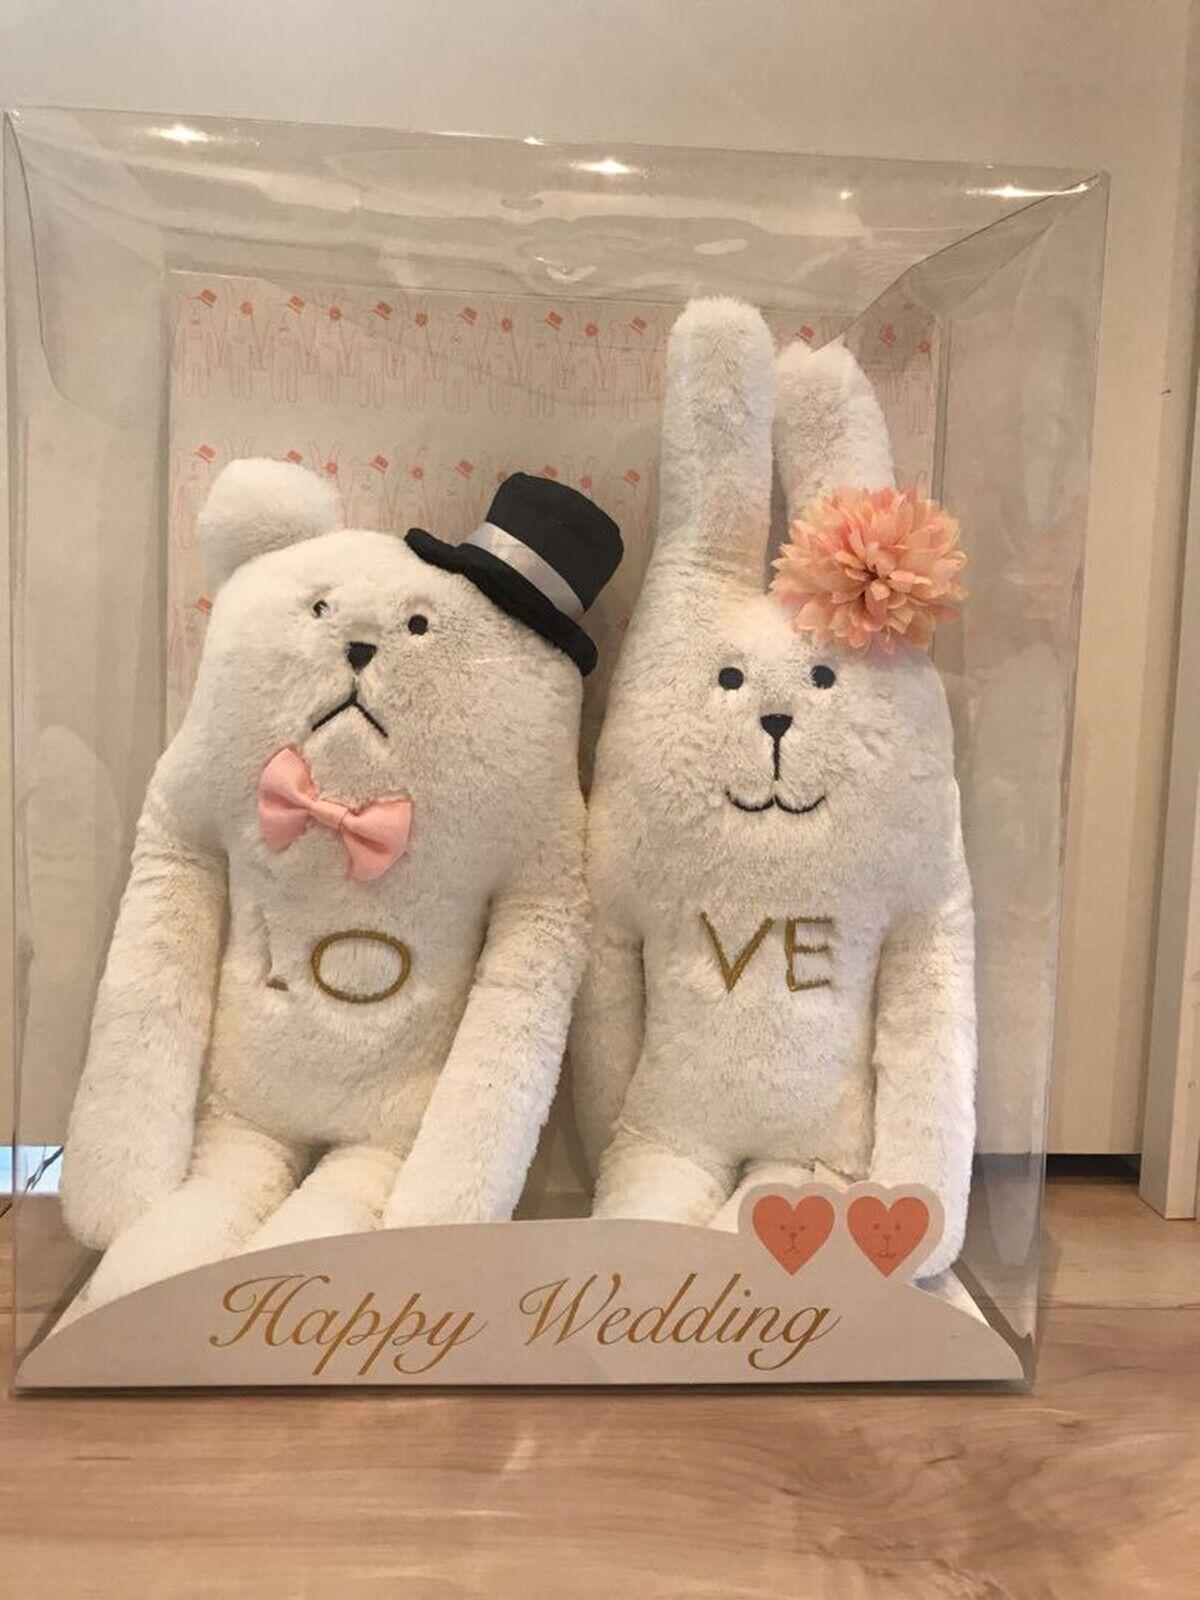 CRAFTHOLIC RAB & SLOTH Bienvenue poupée mariage Craft New